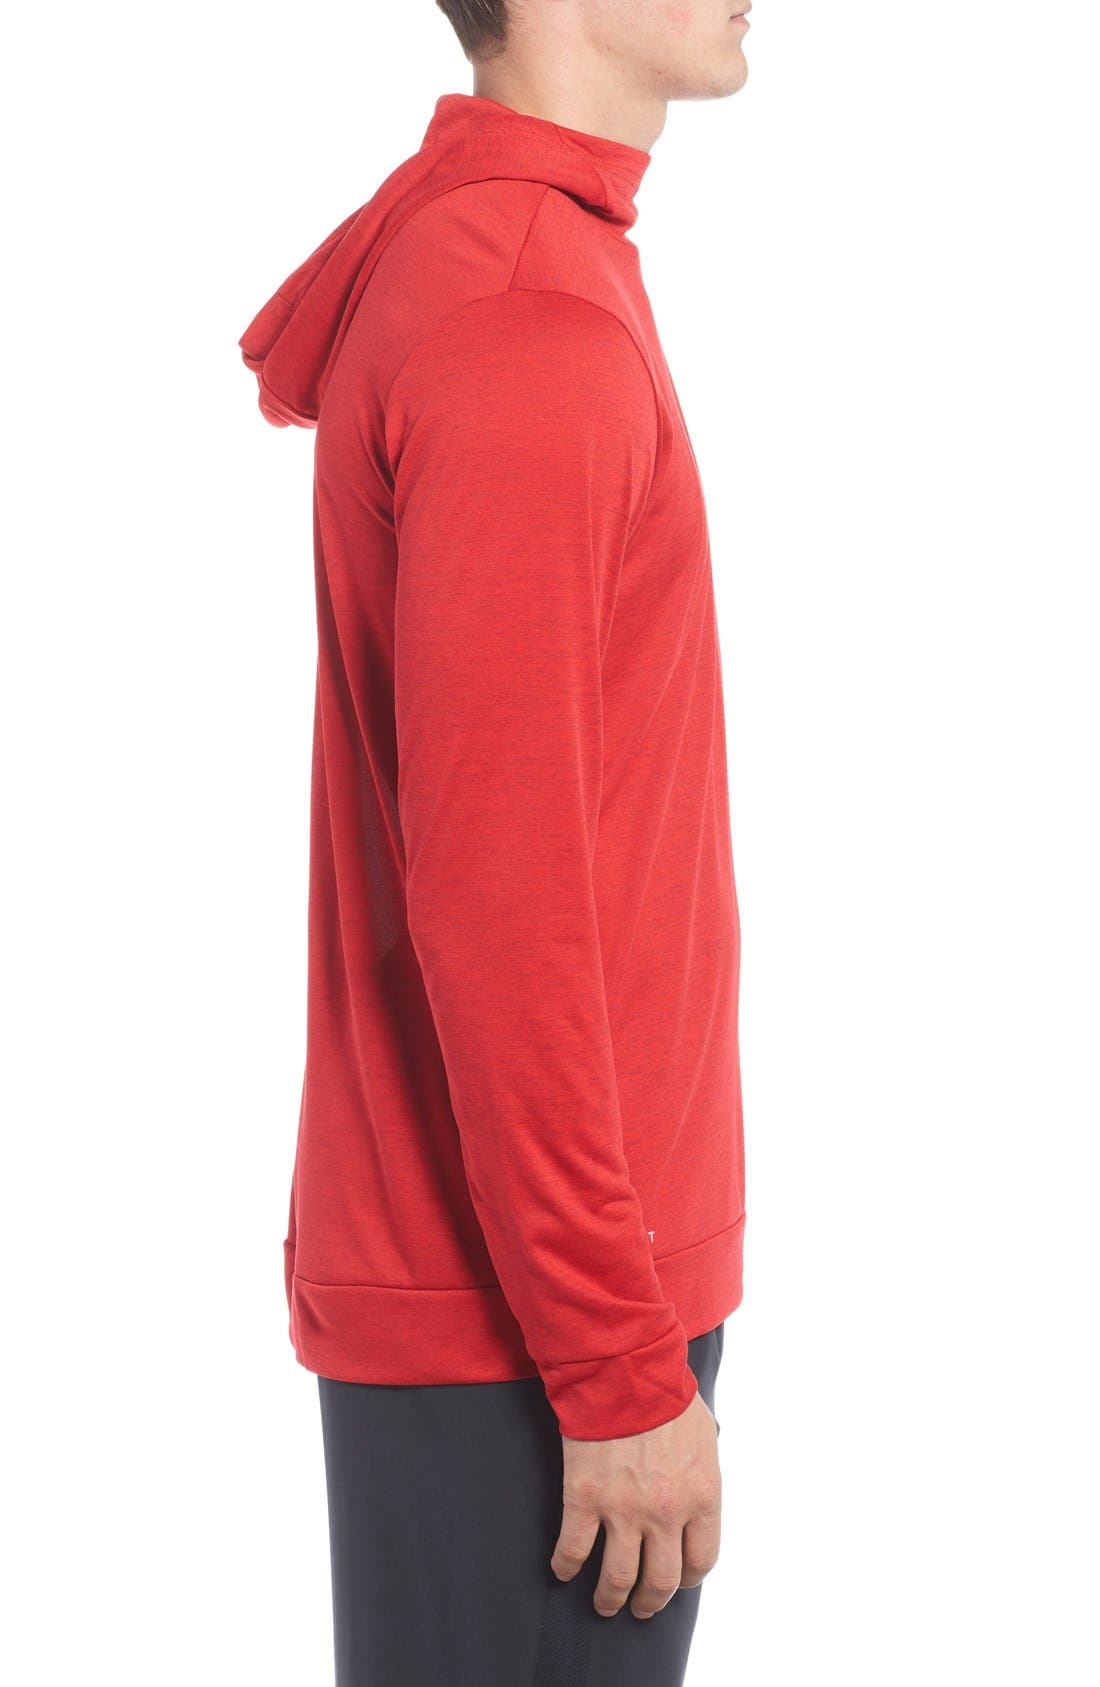 Alternate Image 3  - Nike Dri-FIT Training Hoodie